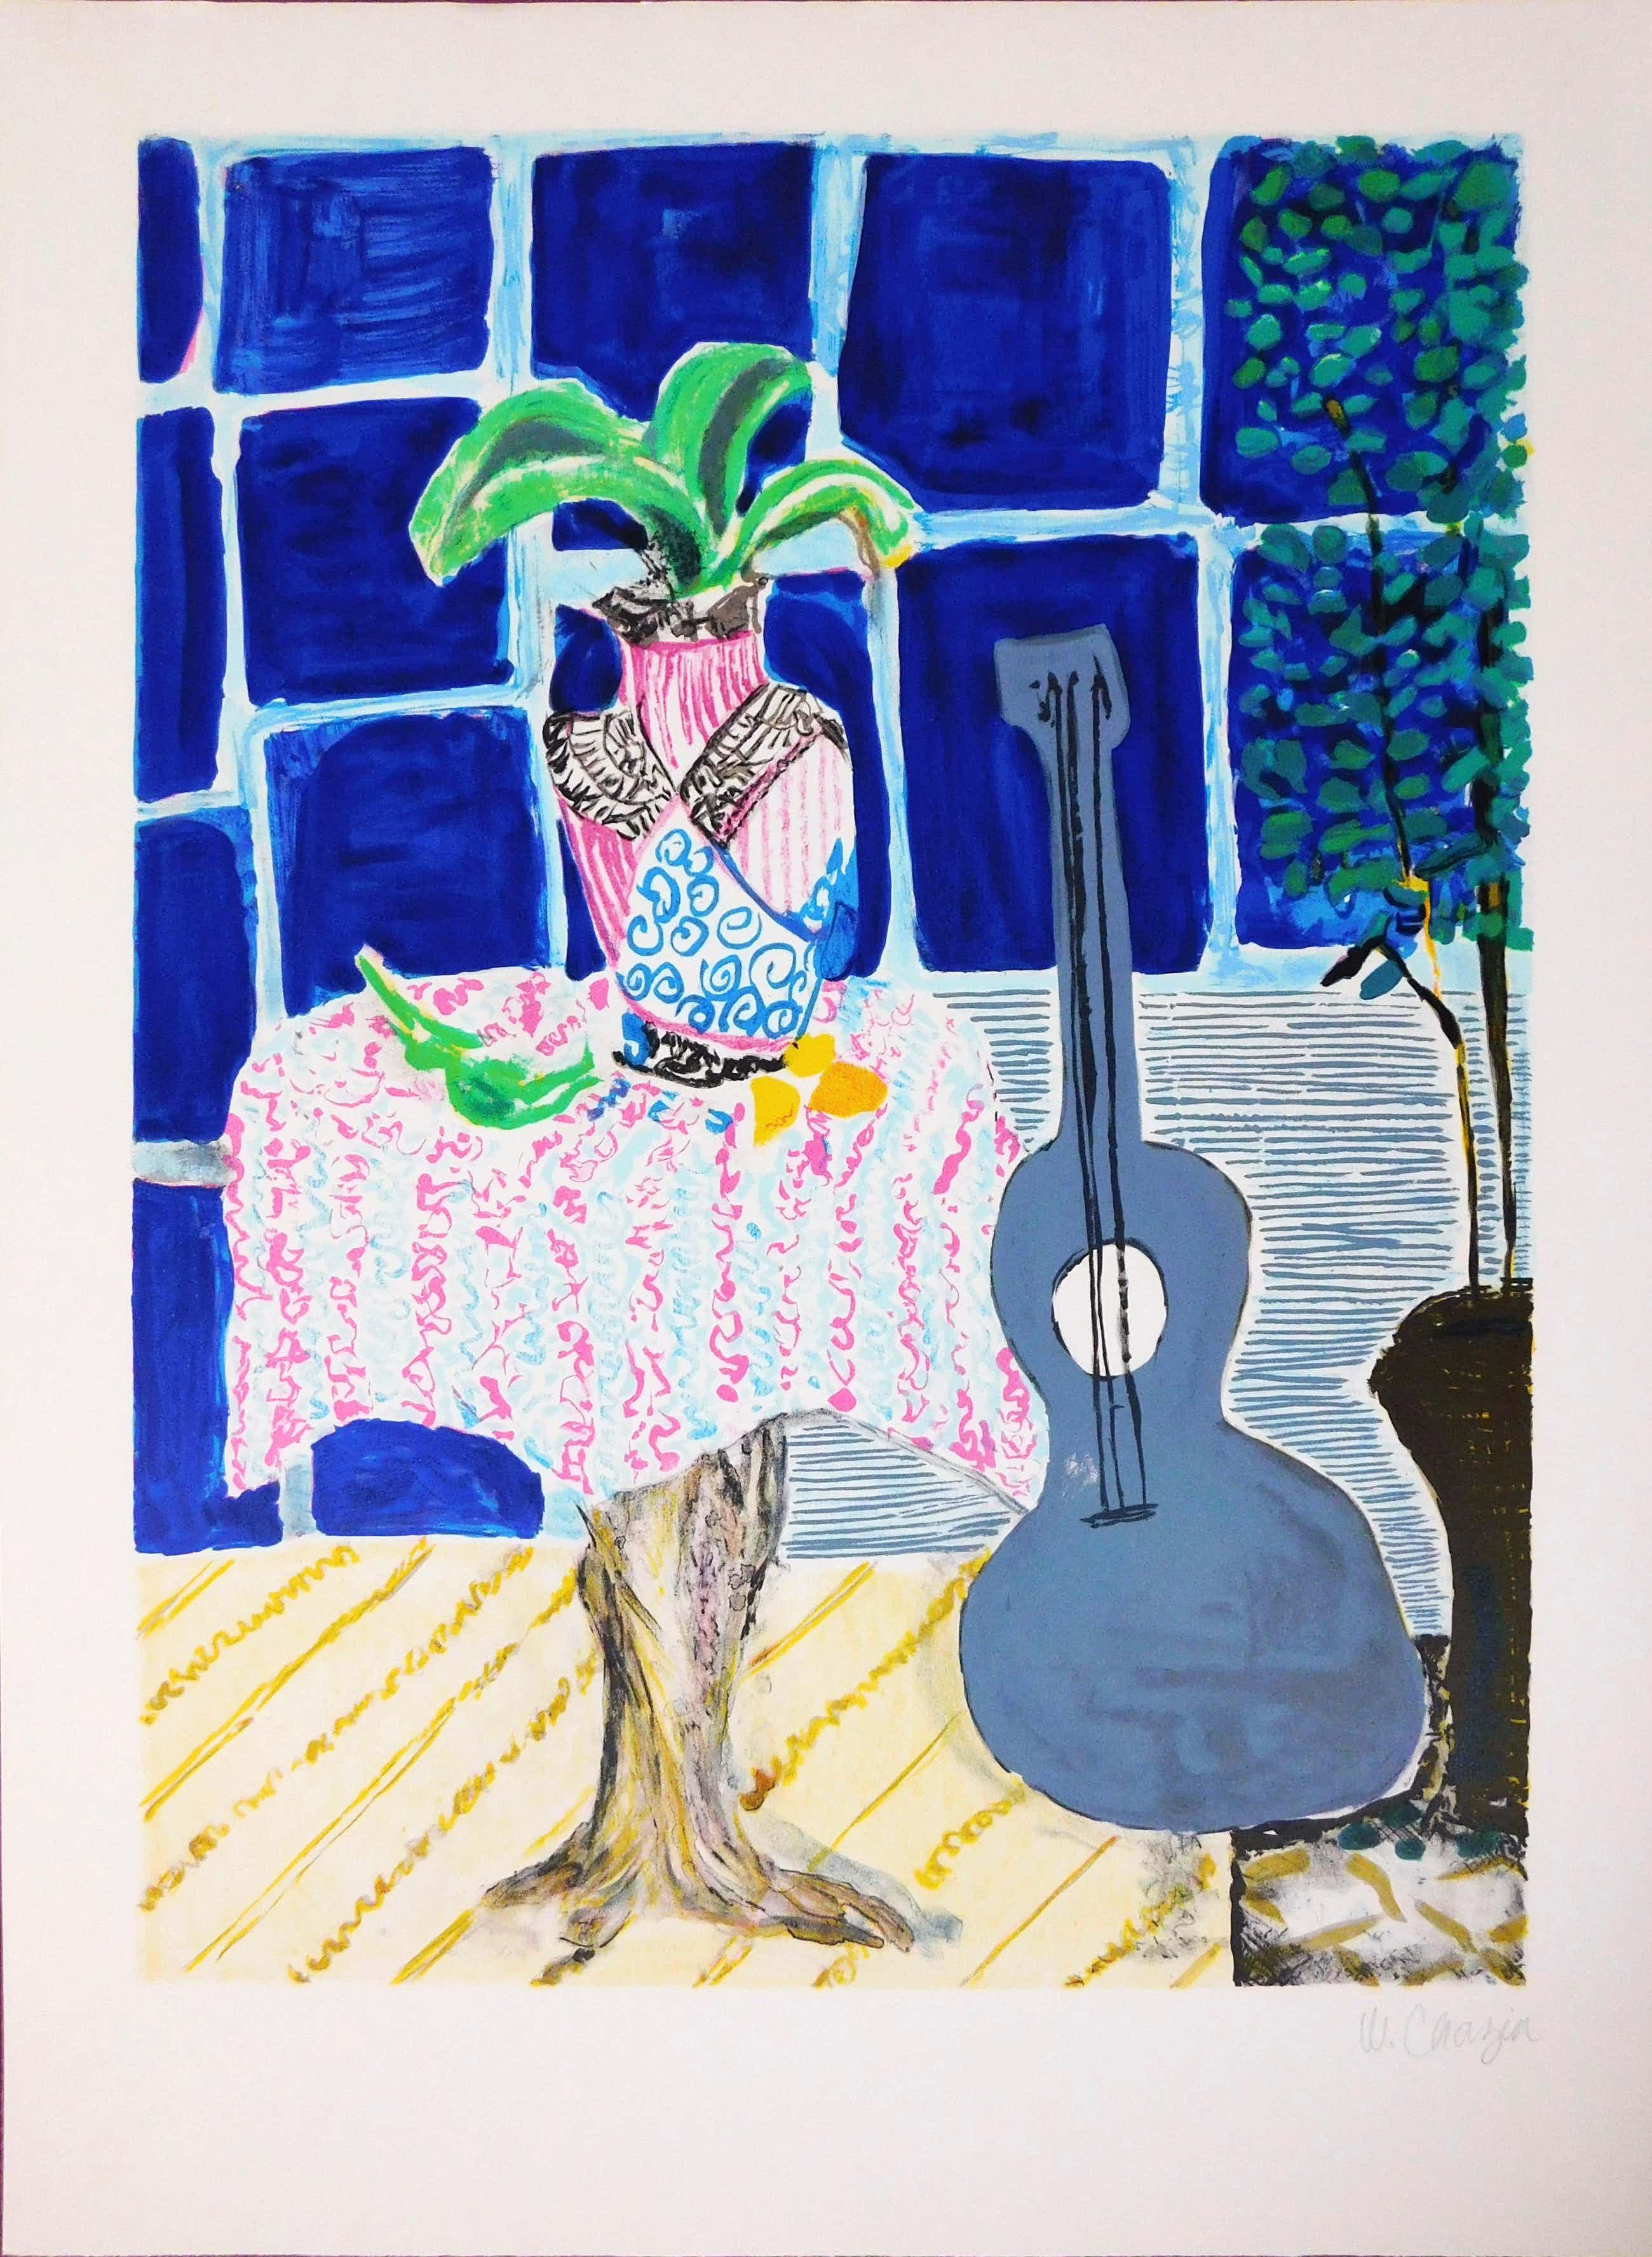 Wendy Chazin - Composition with Guitar and Vase kopen? Bied vanaf 35!